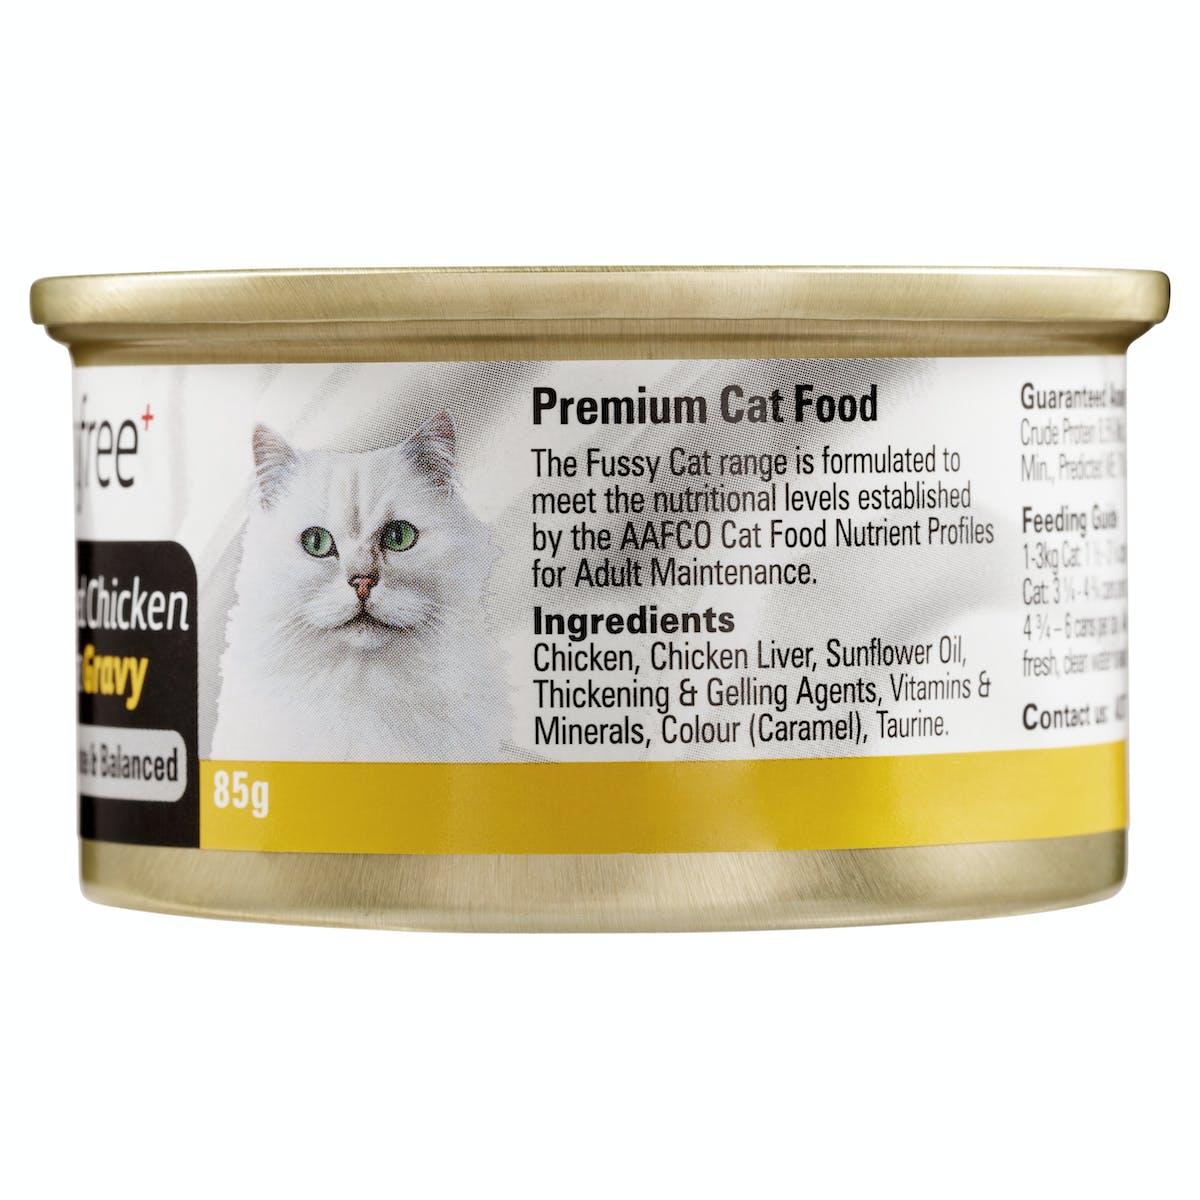 Fussy Cat | Shredded Chicken & Liver in Gravy 85g | Wet Cat Food | Right of pack